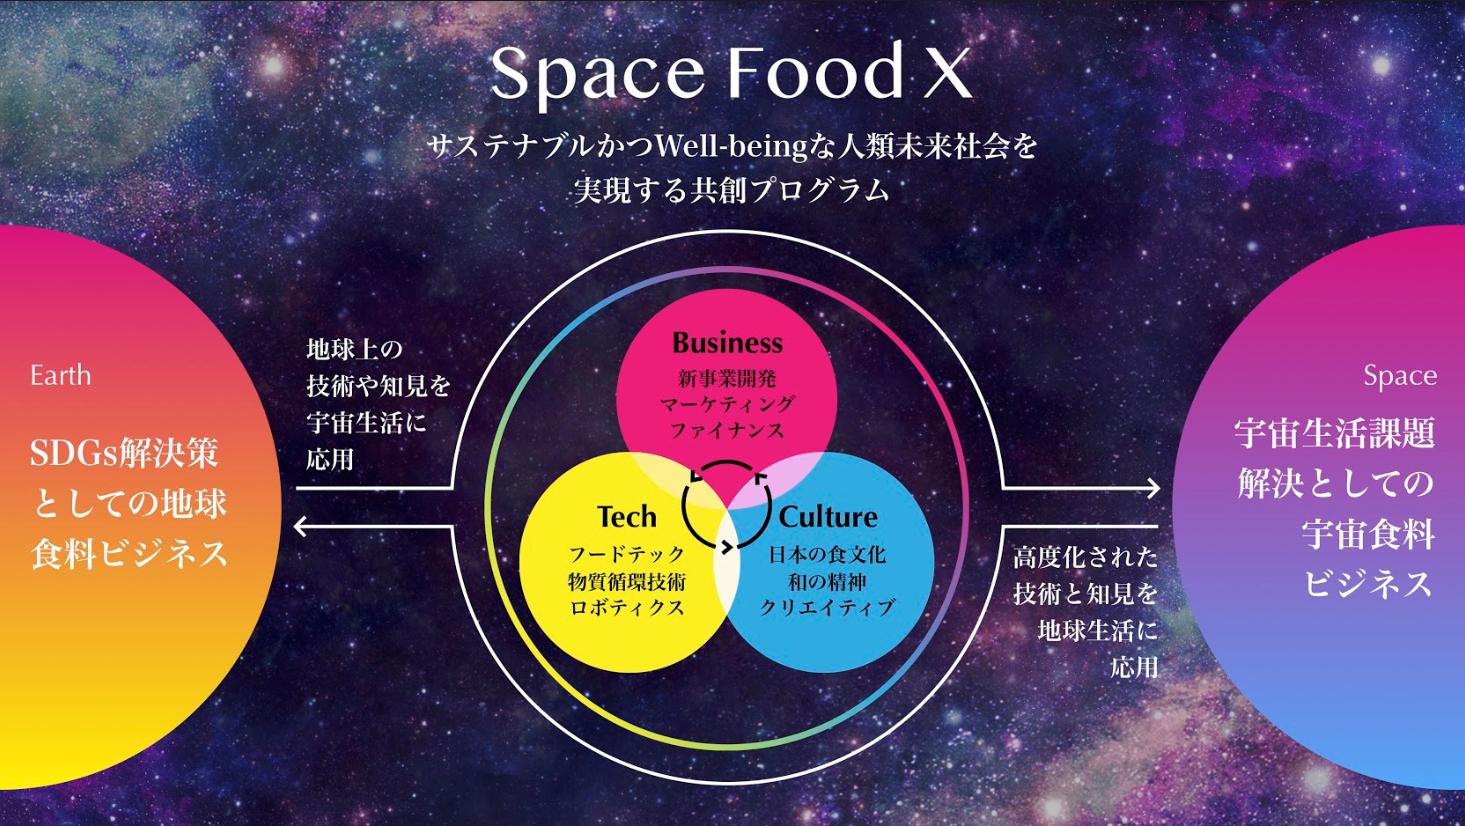 (画像提供)Space Food X